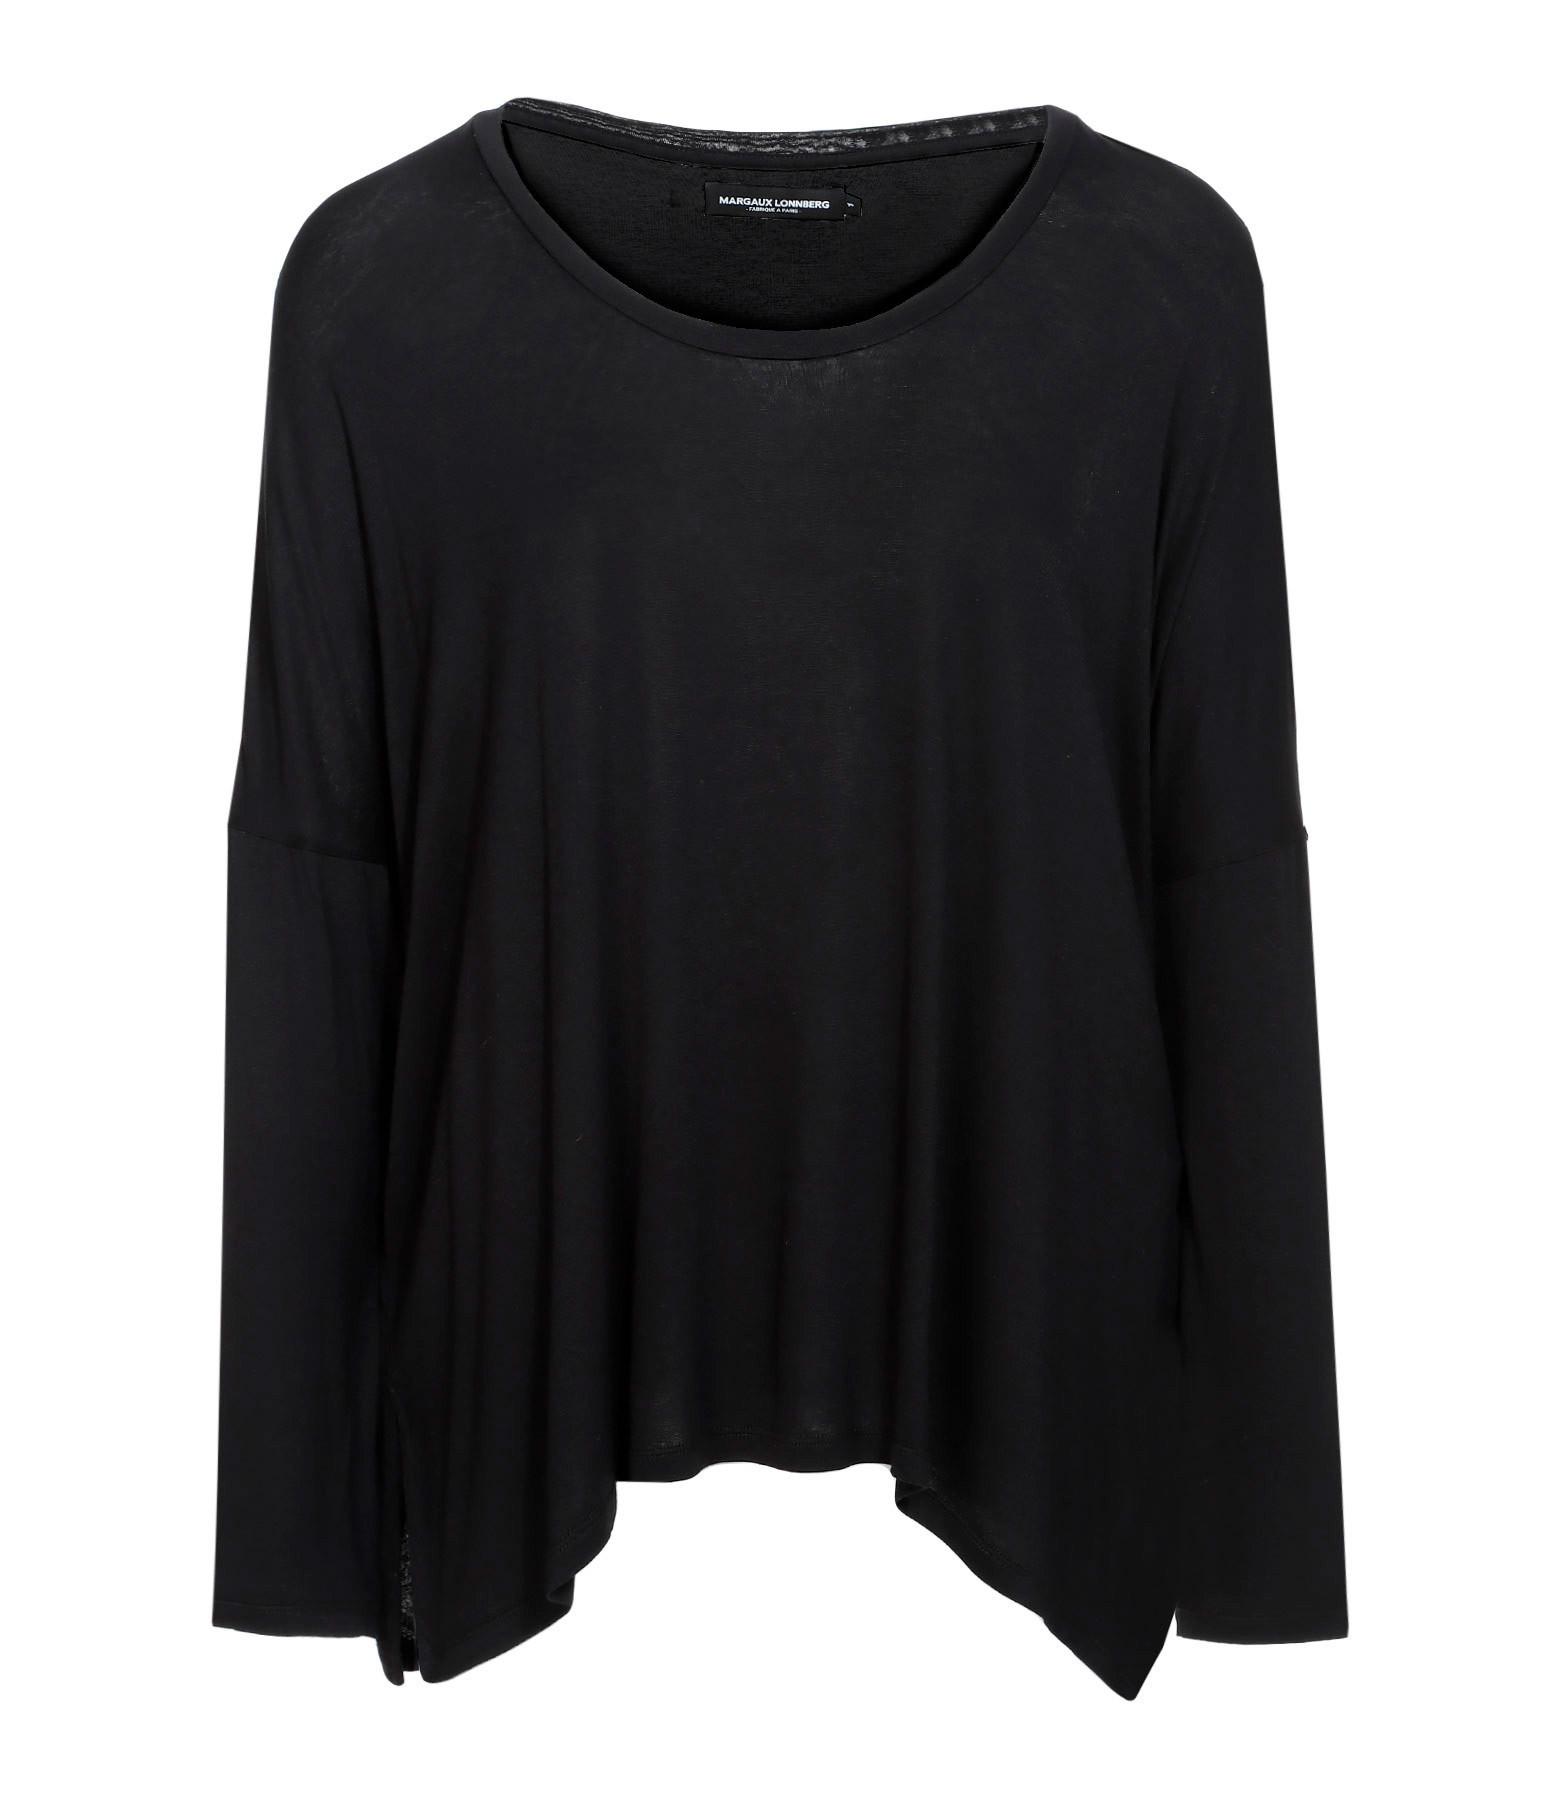 MARGAUX LONNBERG - Tee-shirt Ines Coton Noir